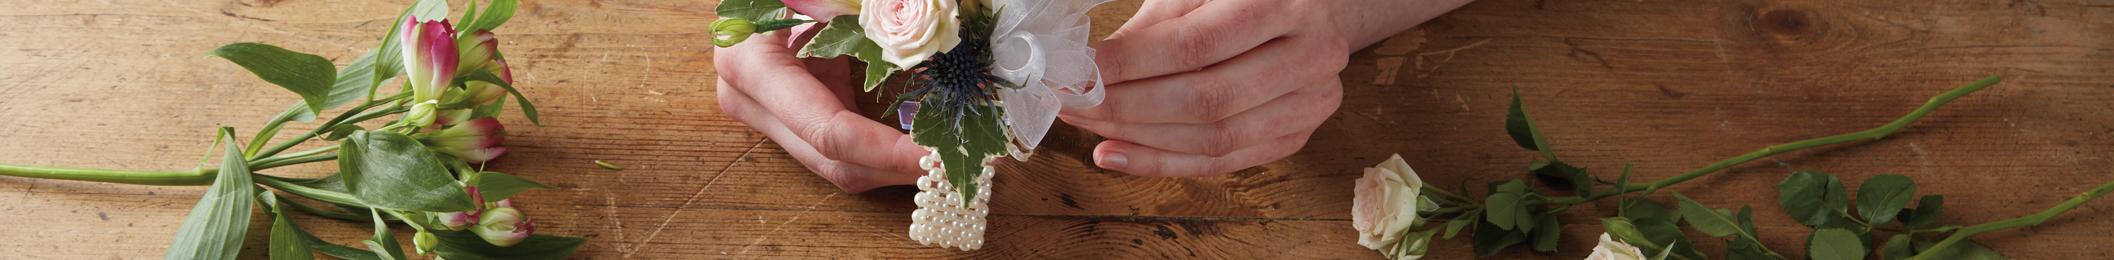 Floral & Craft